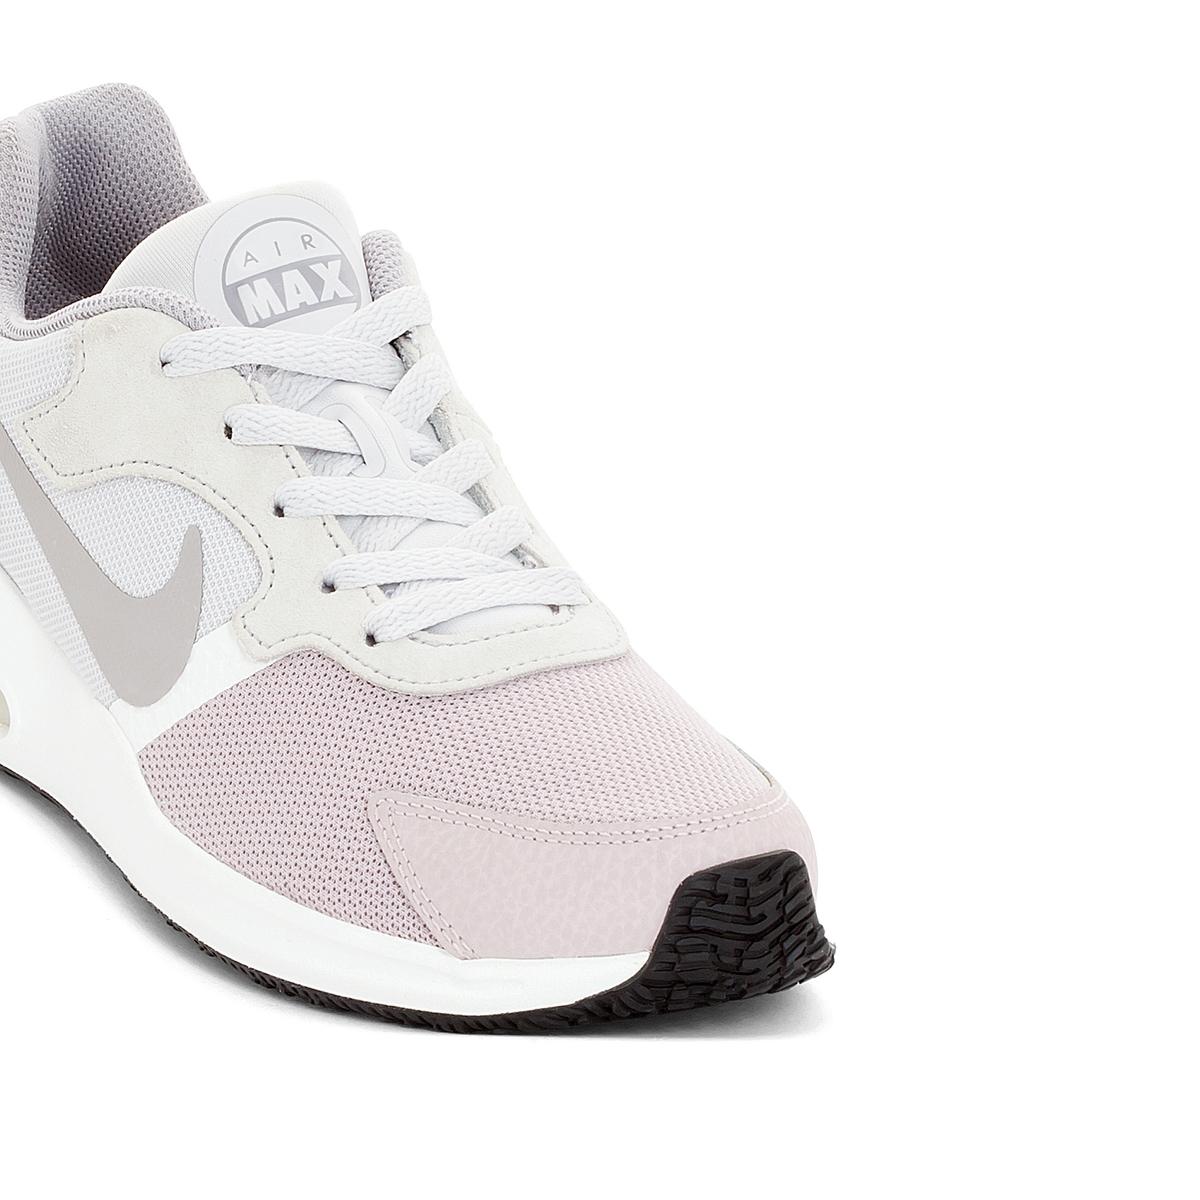 Imagen secundaria de producto de Zapatillas Air Max Guile - Nike